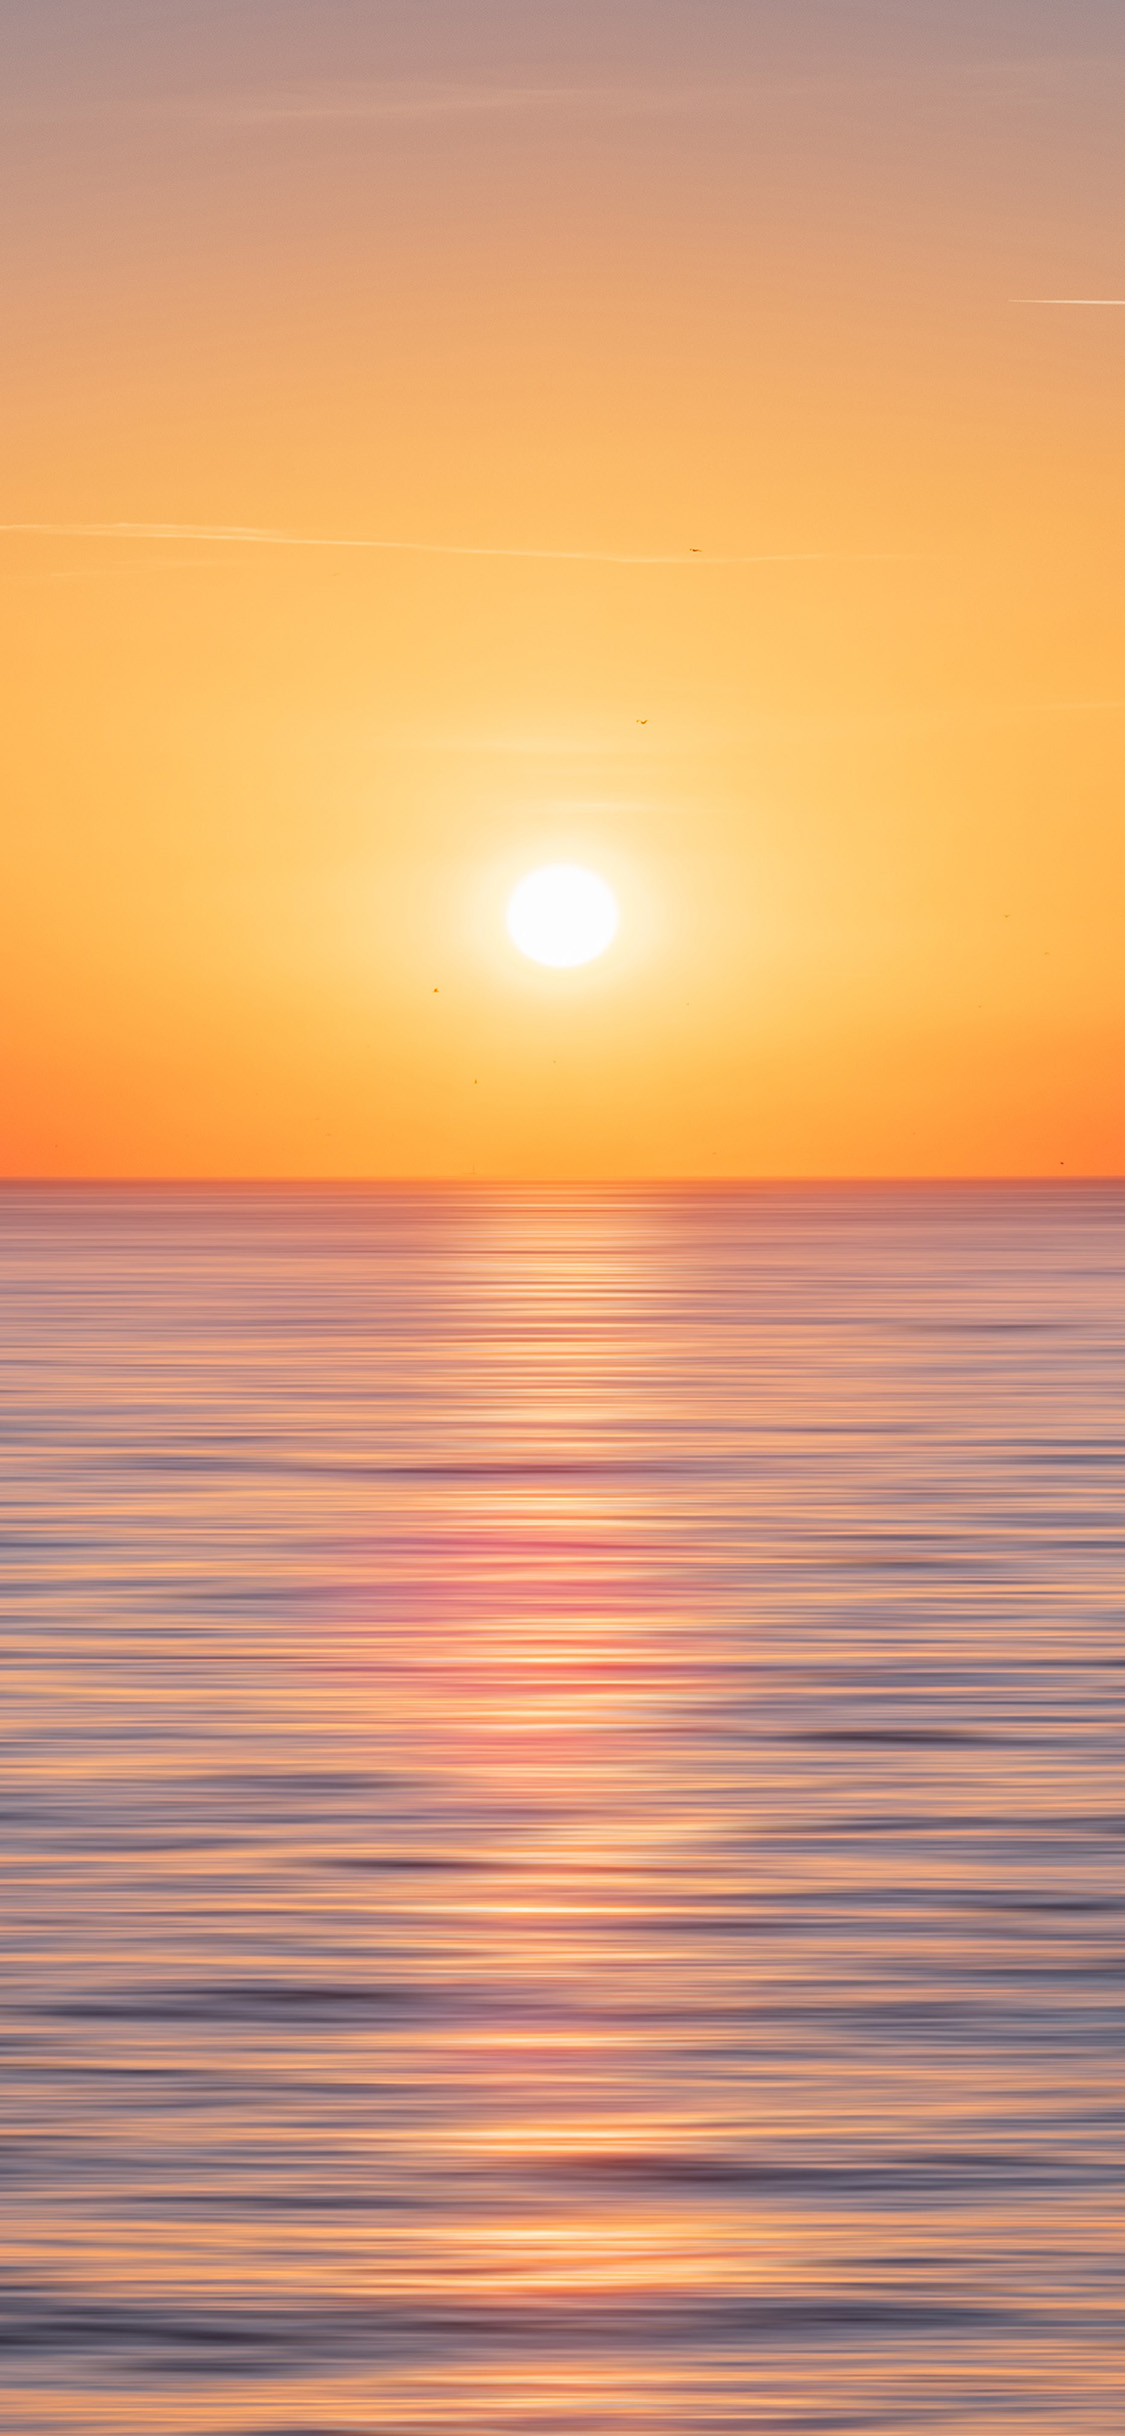 iPhonexpapers.com-Apple-iPhone-wallpaper-od33-nature-sun-sunset-sea-sky-ocean